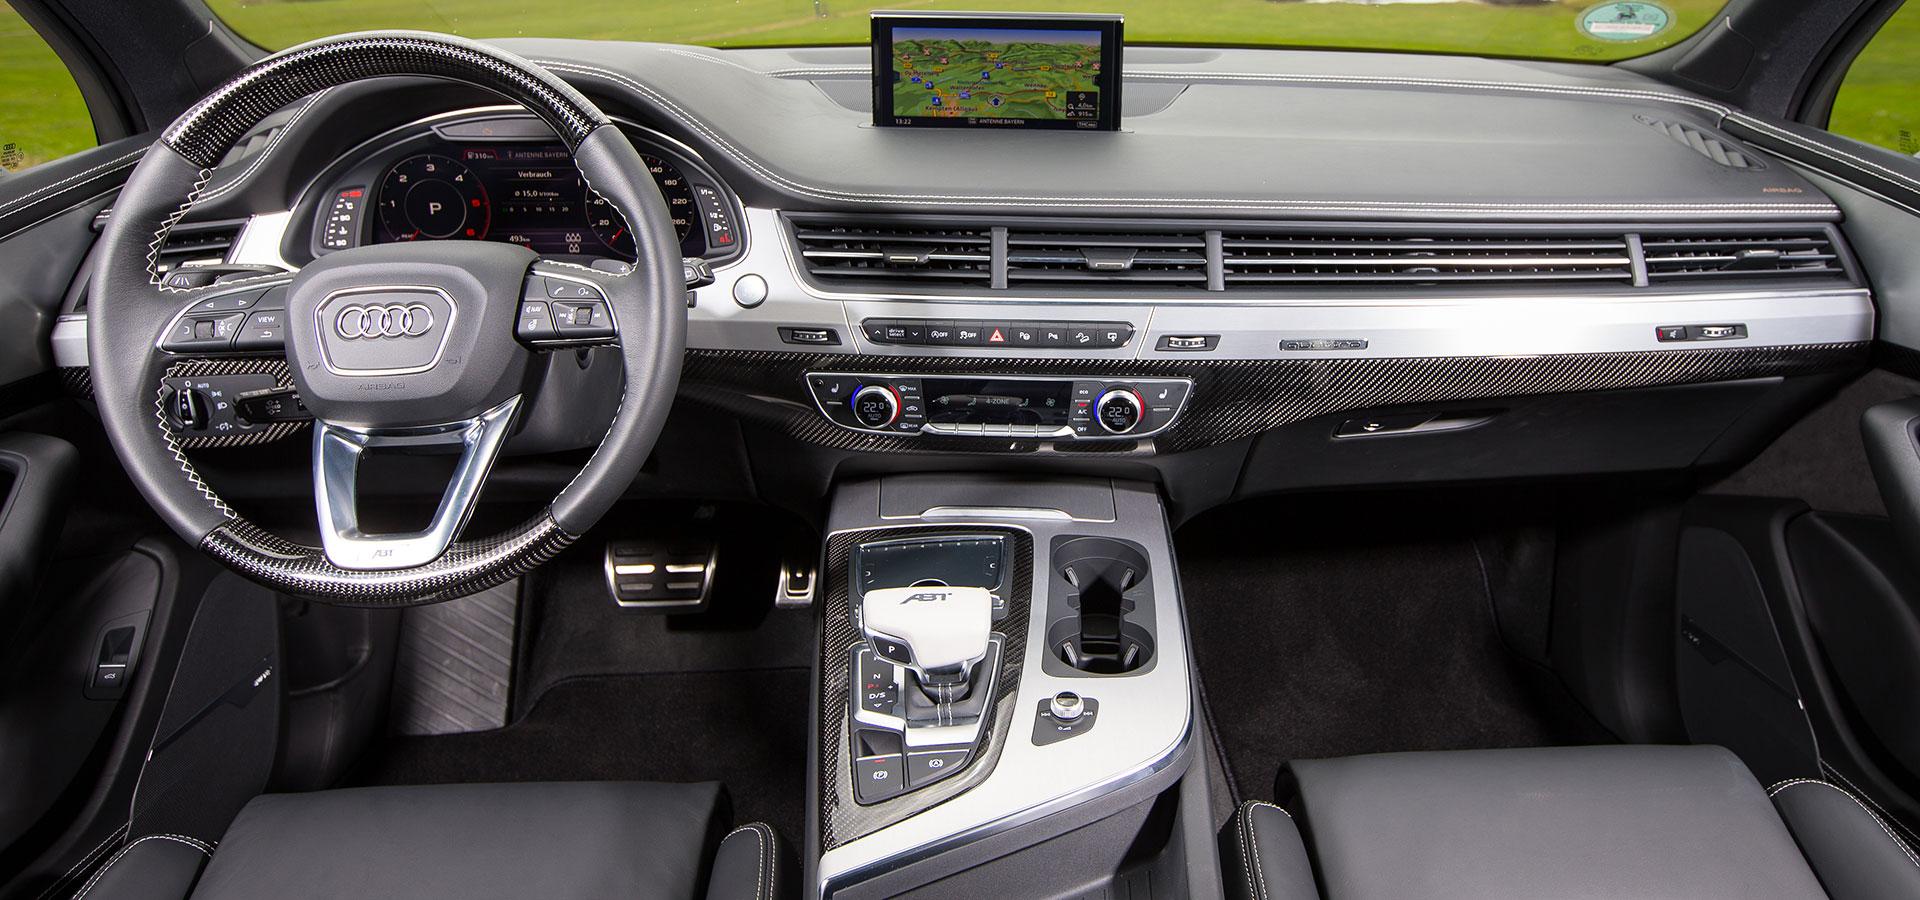 Audi Q7 - ABT Sportsline